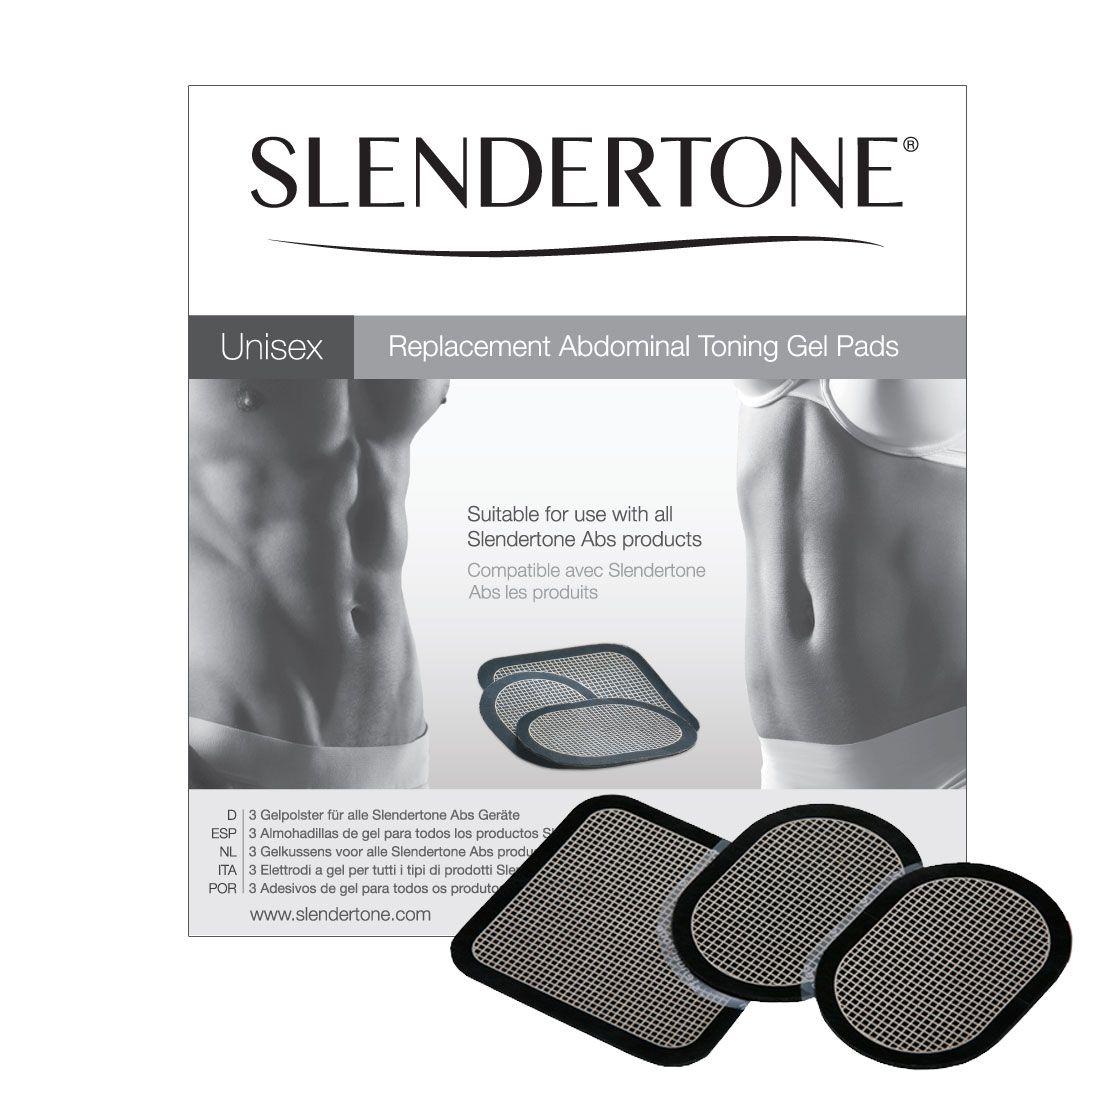 Slendertone Electrodes Abs8, Abs7, Abs6, Abs5, Connect Abs, et Abs3. 2 achetés = 1 offert !